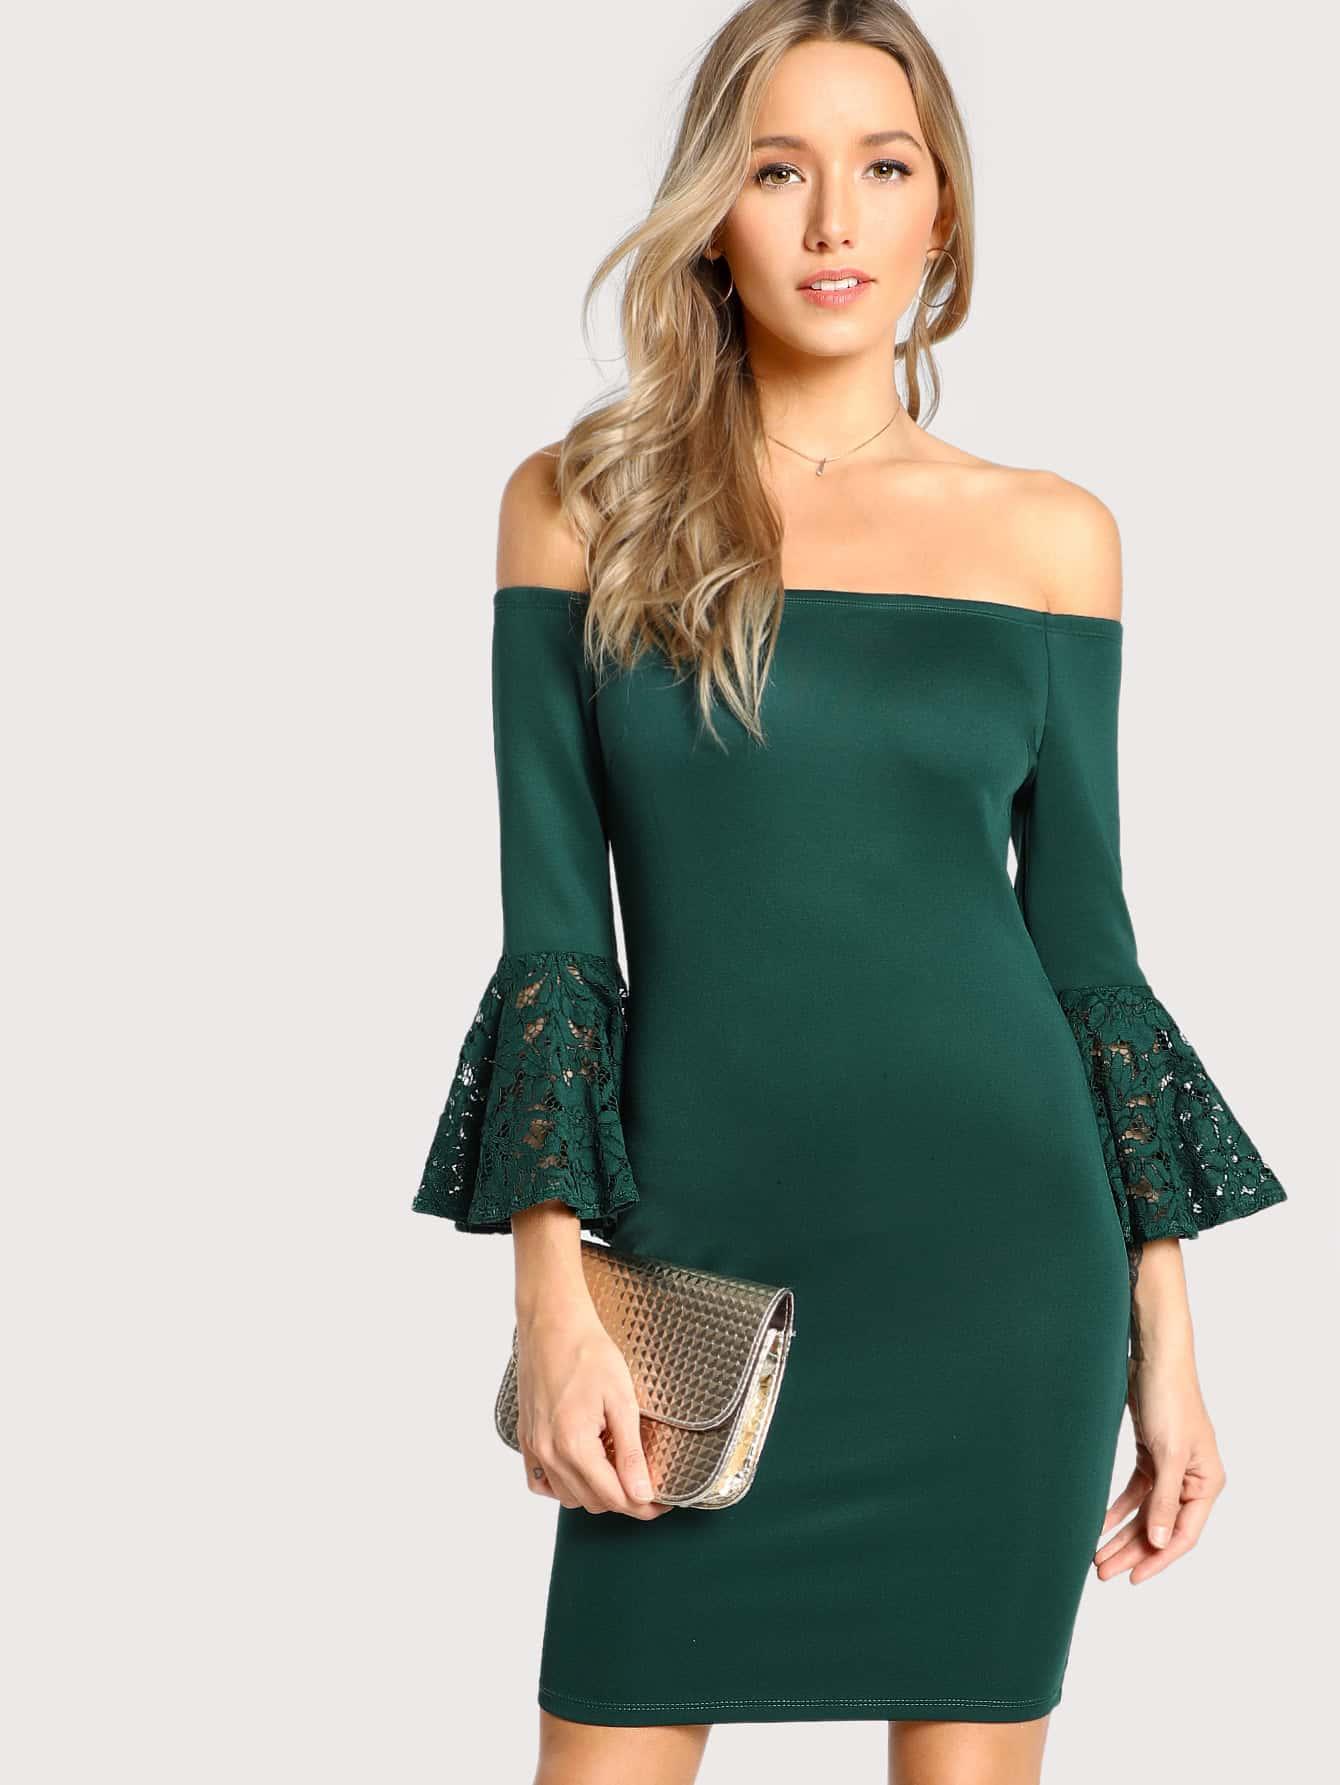 Bell Sleeve Bardot Bodycon Dress dressmmc171025702